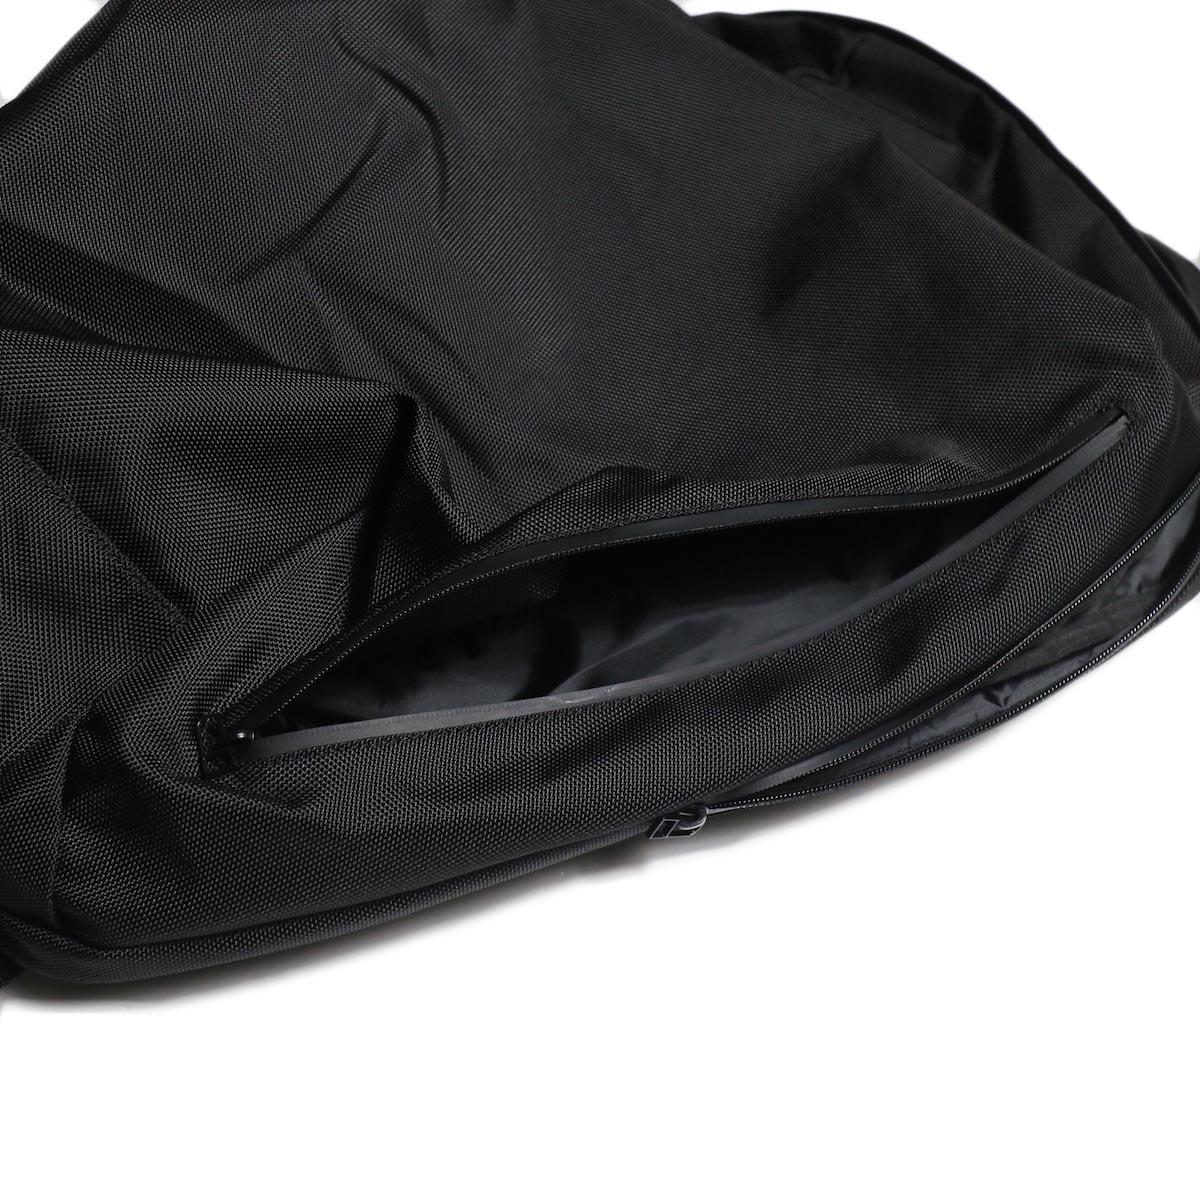 UNIVERSAL PRODUCTS / NEW UTILITY BAG (Black)サイドジップ